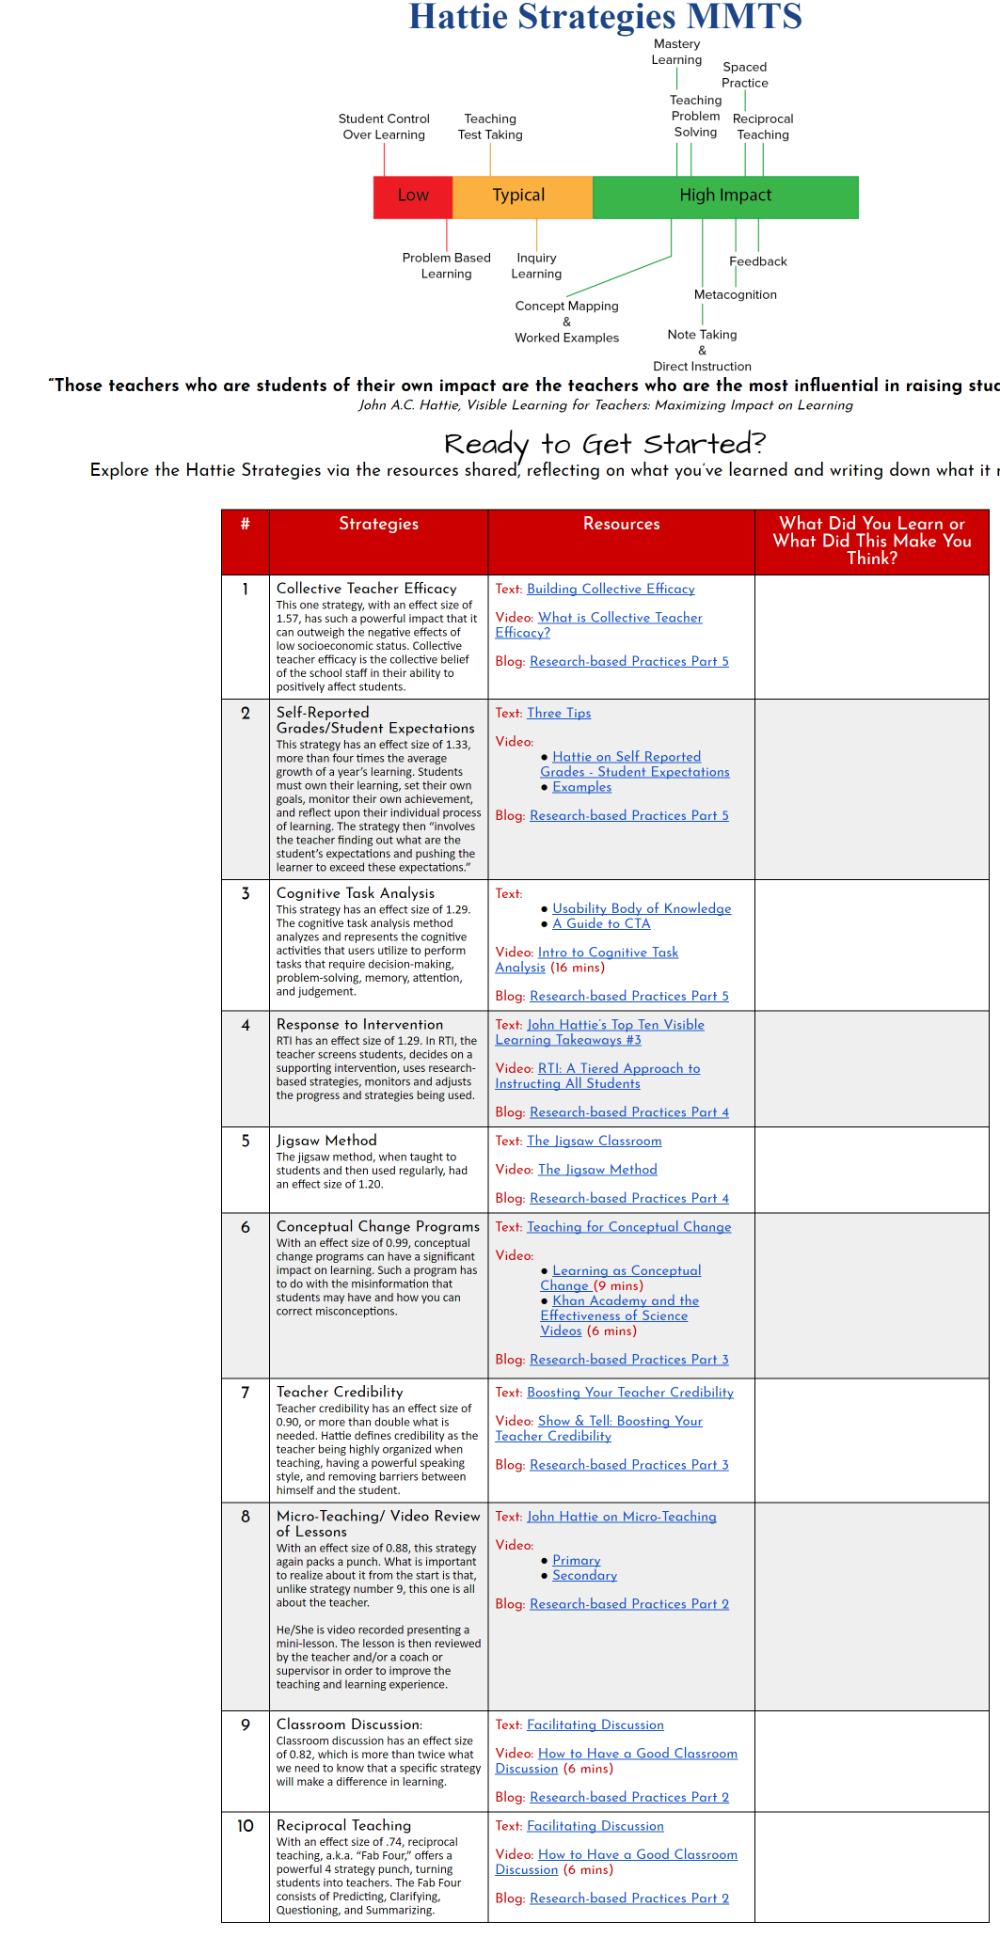 Teaching Strategies That Work Technotes Blog Teaching Strategies Problem Based Learning Reciprocal Teaching [ 1937 x 1000 Pixel ]